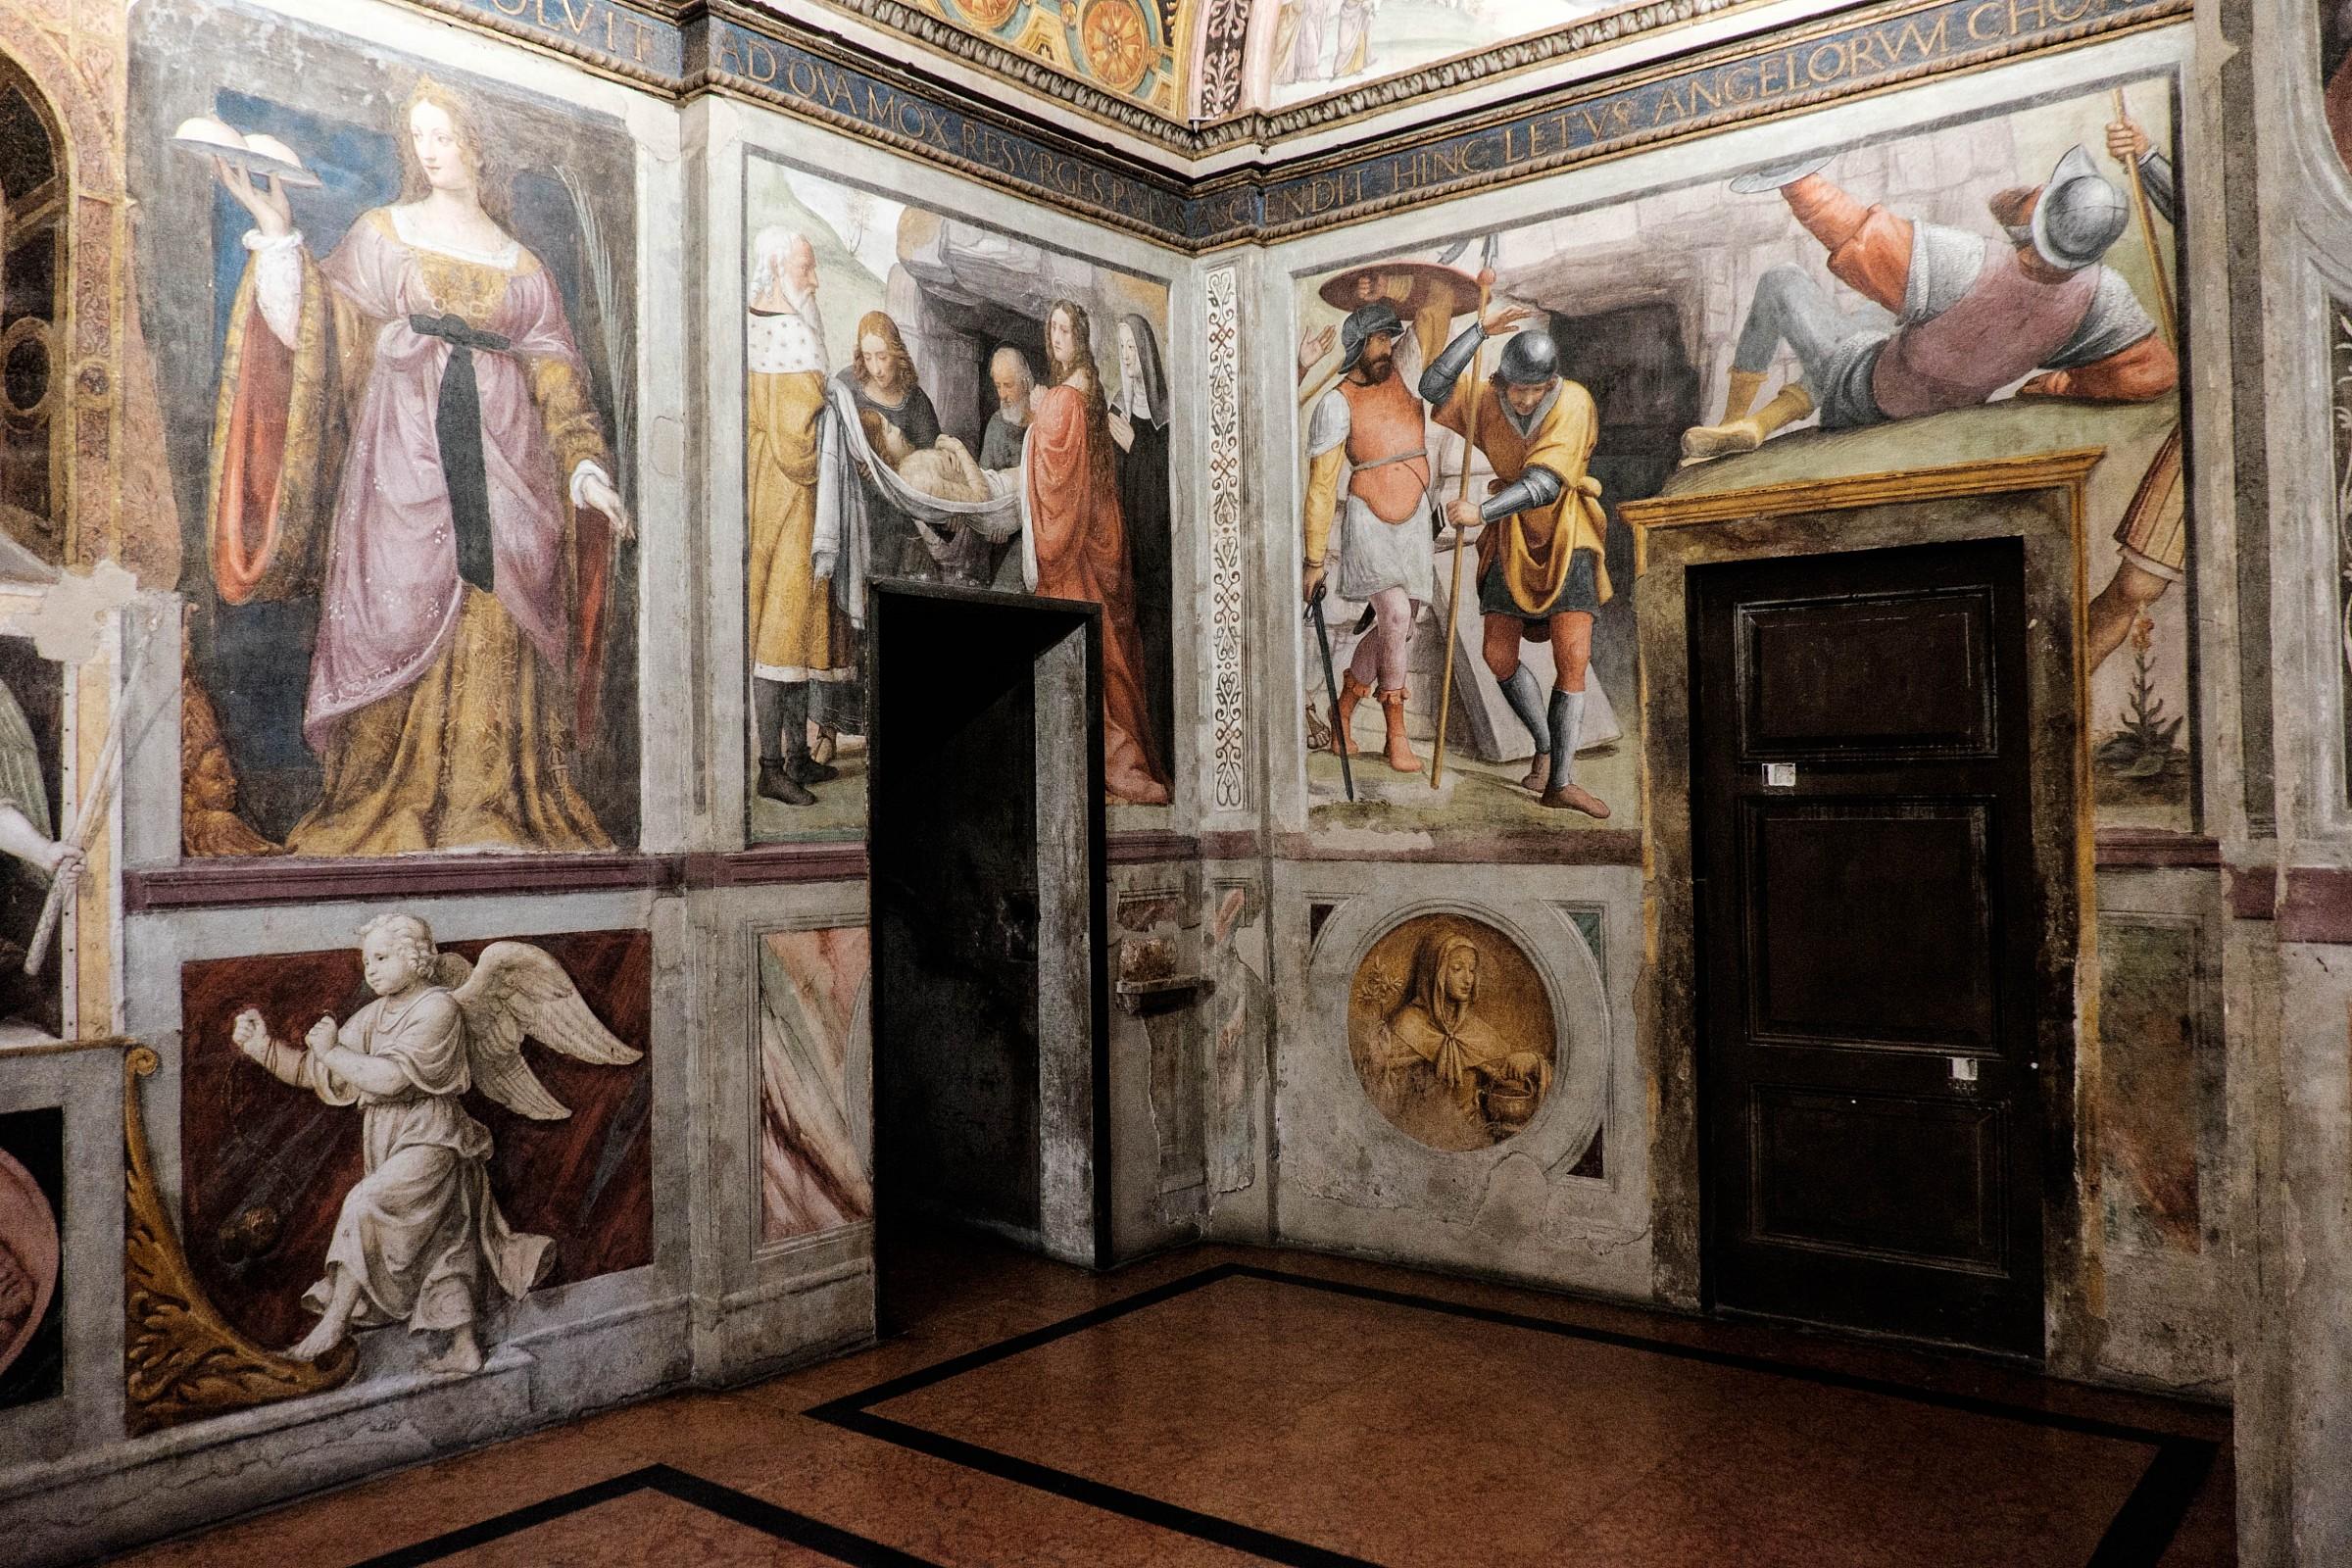 Doors and frescoes...